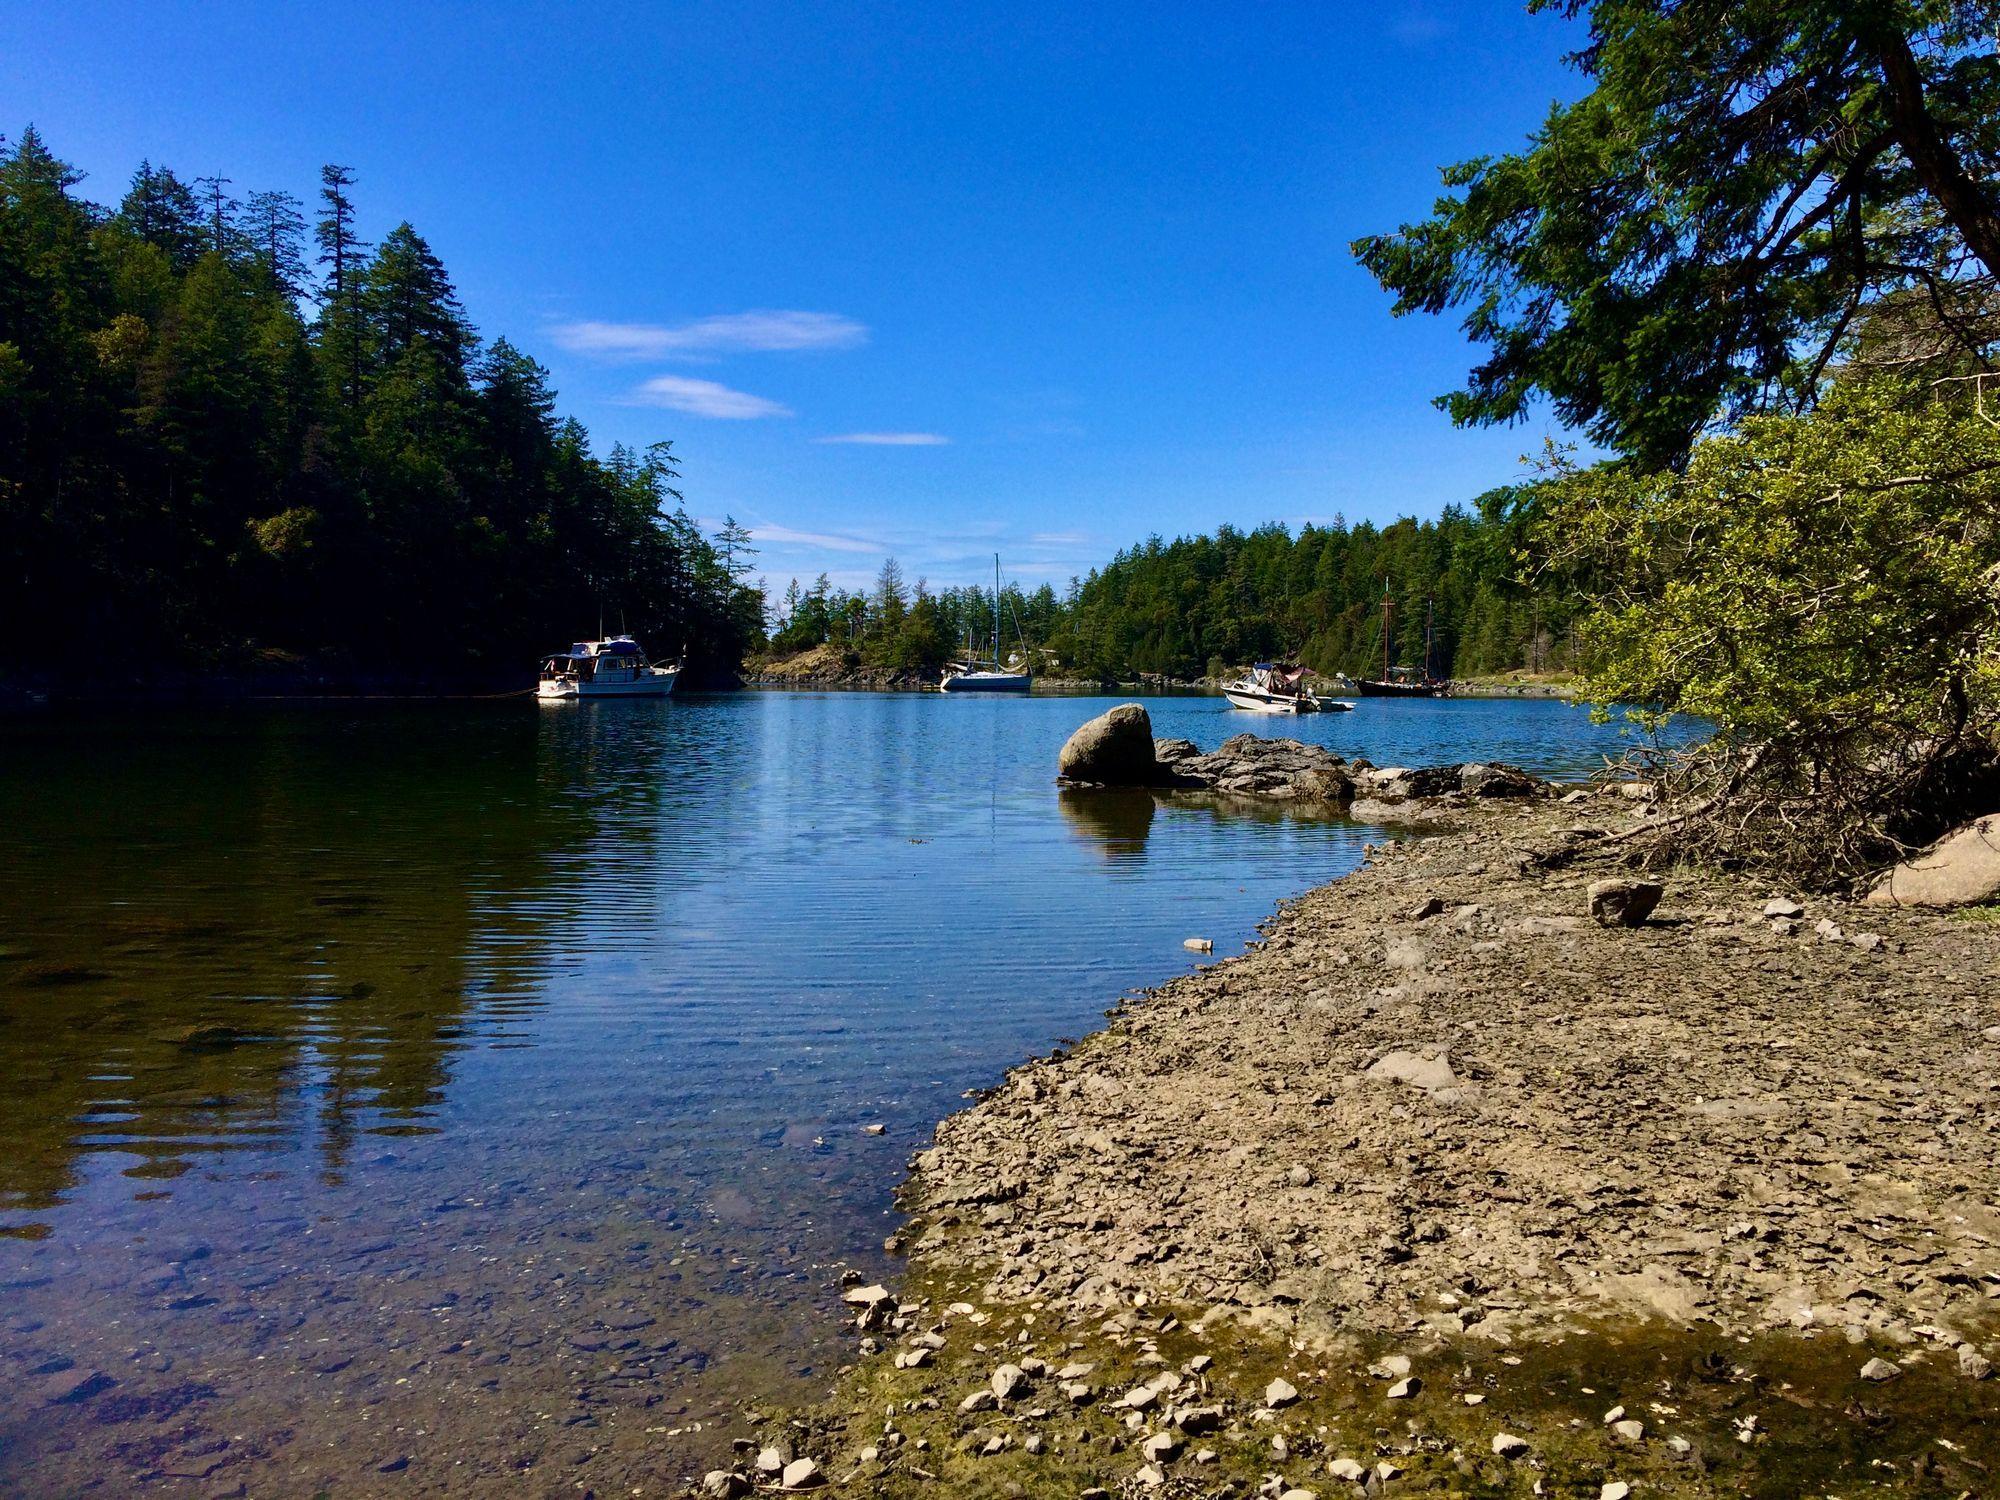 Postcard from Smuggler's Cove Marine Provincial Park